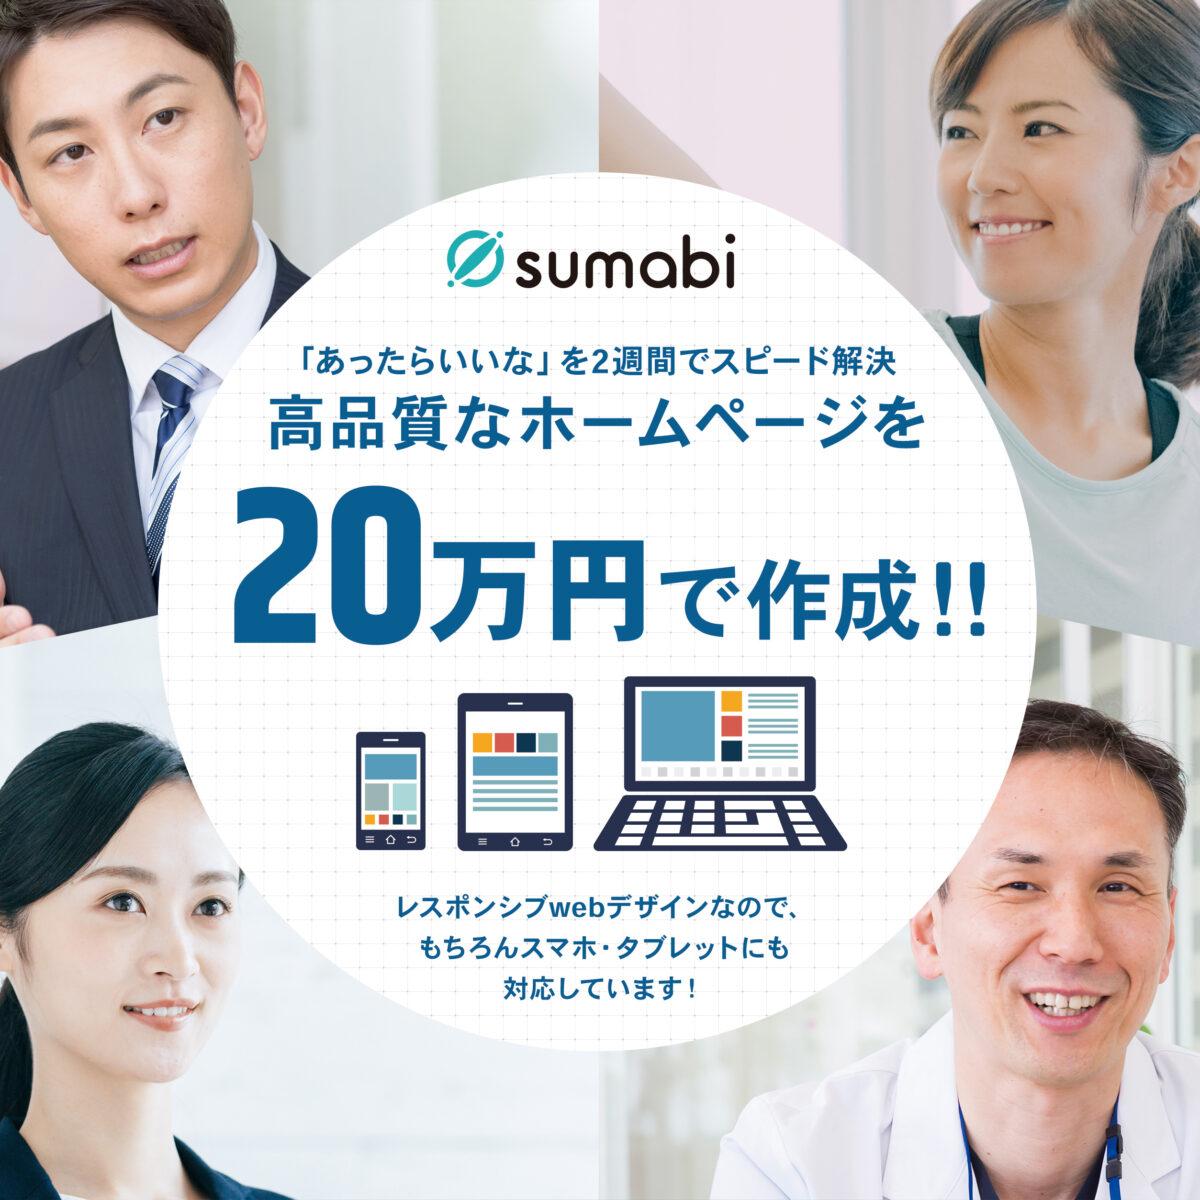 sumabi